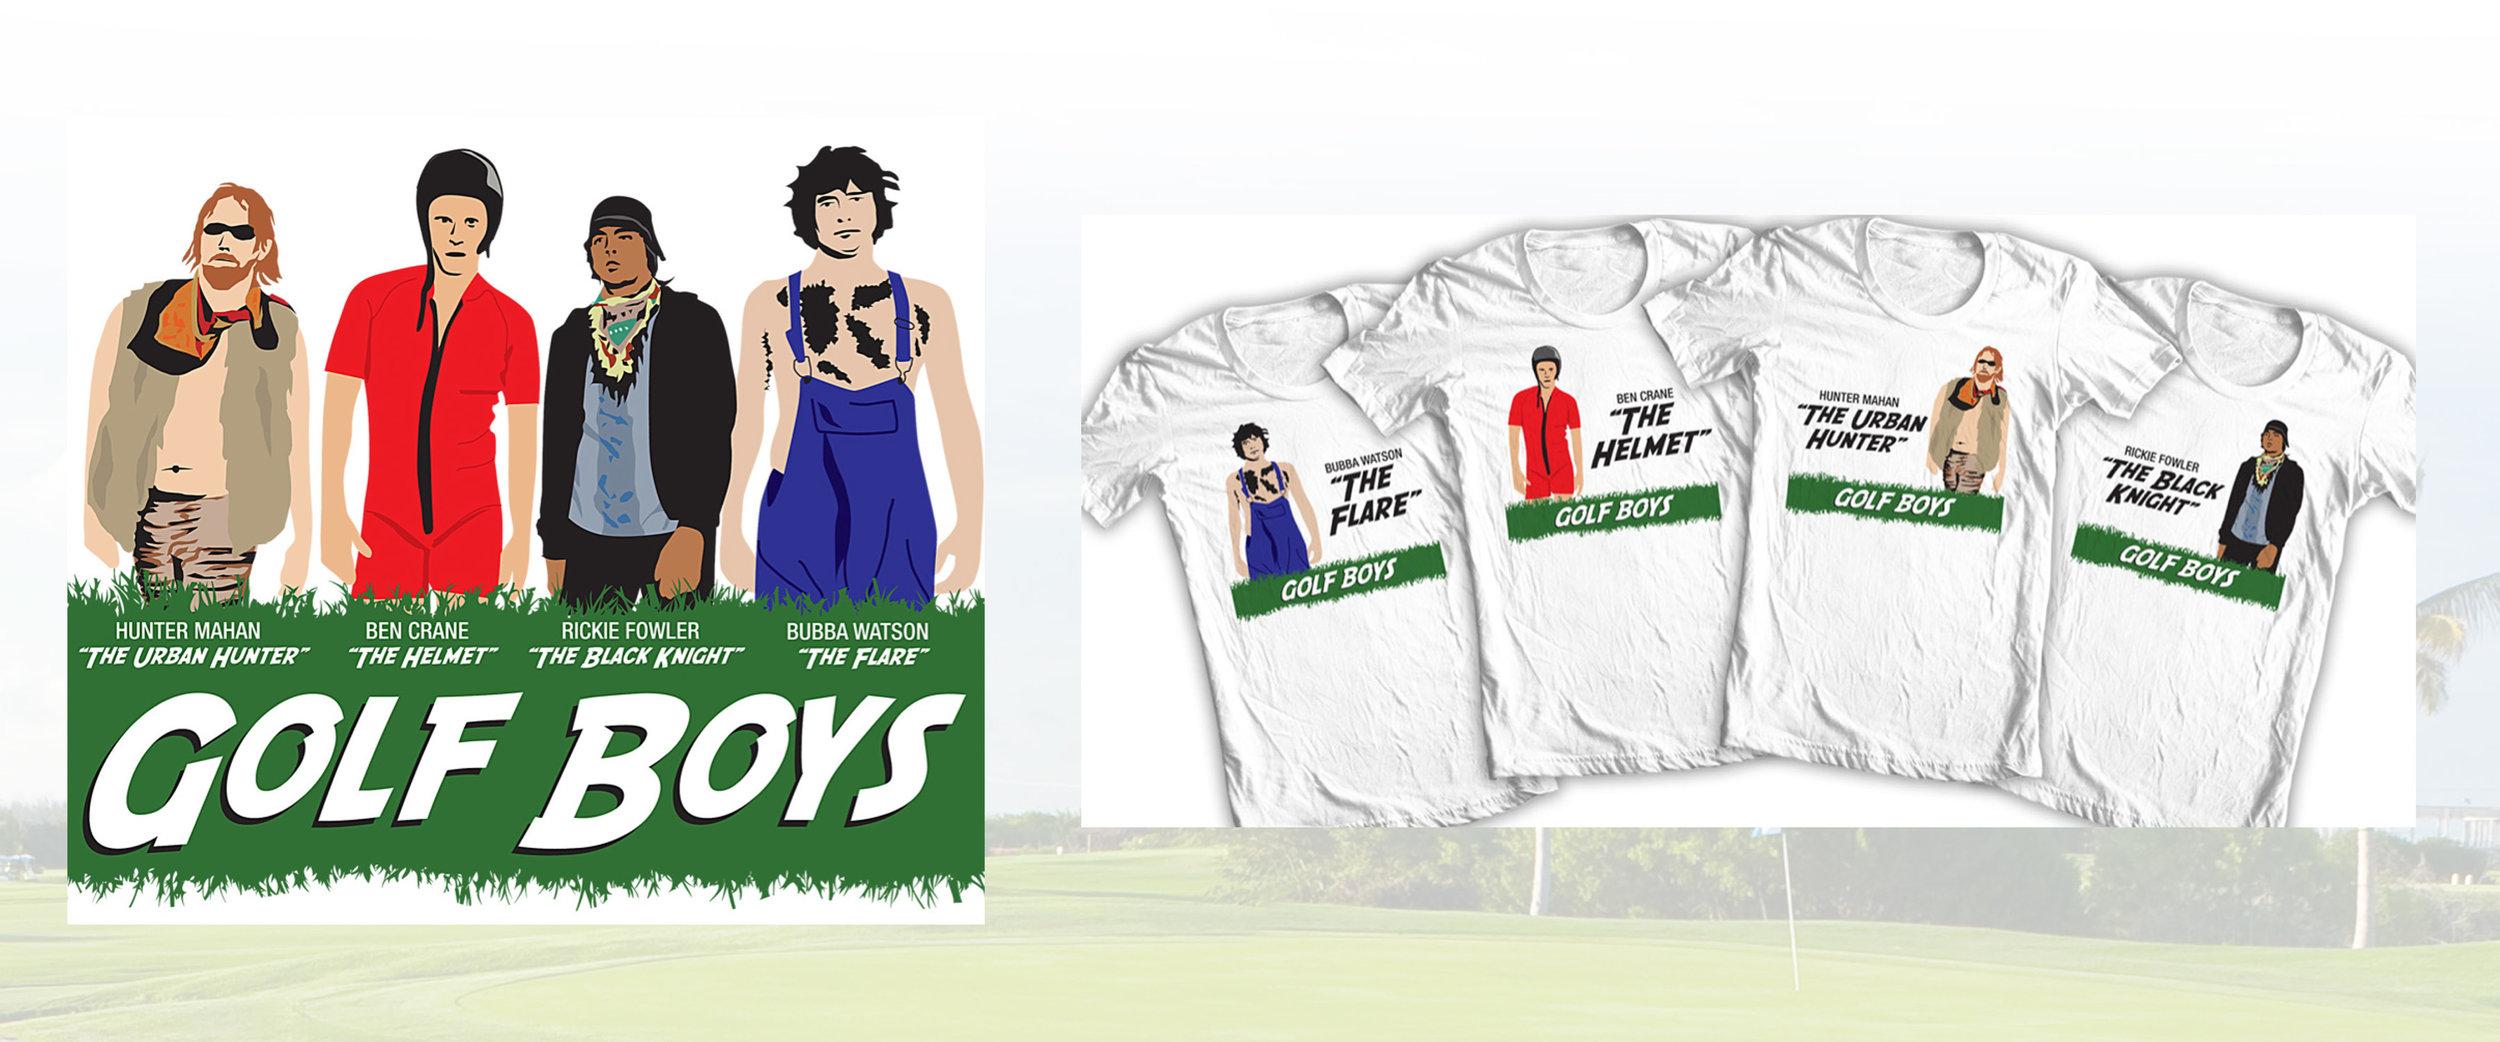 Wears My Shirt - Custom Products Anything - Golf Boys.jpg